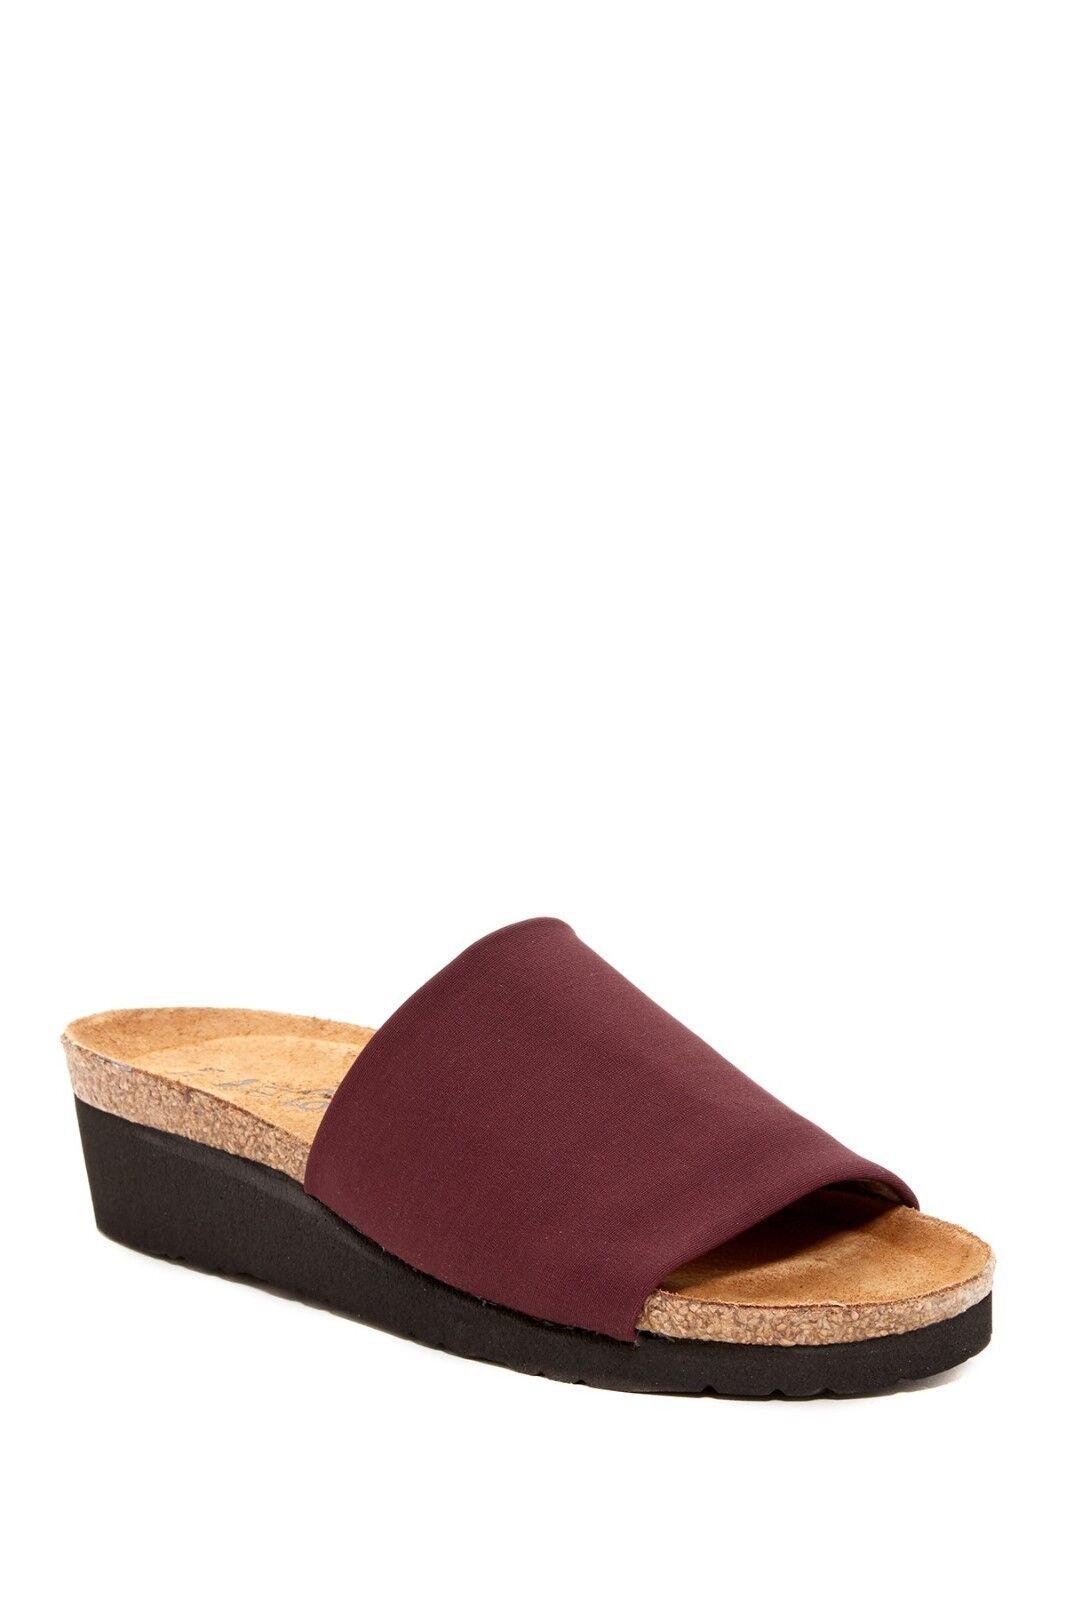 Naot ALANA Slide Sandale NIB SlipOn Mule ORTHOTIC Wedge PLUM STRETCH 37  41 42